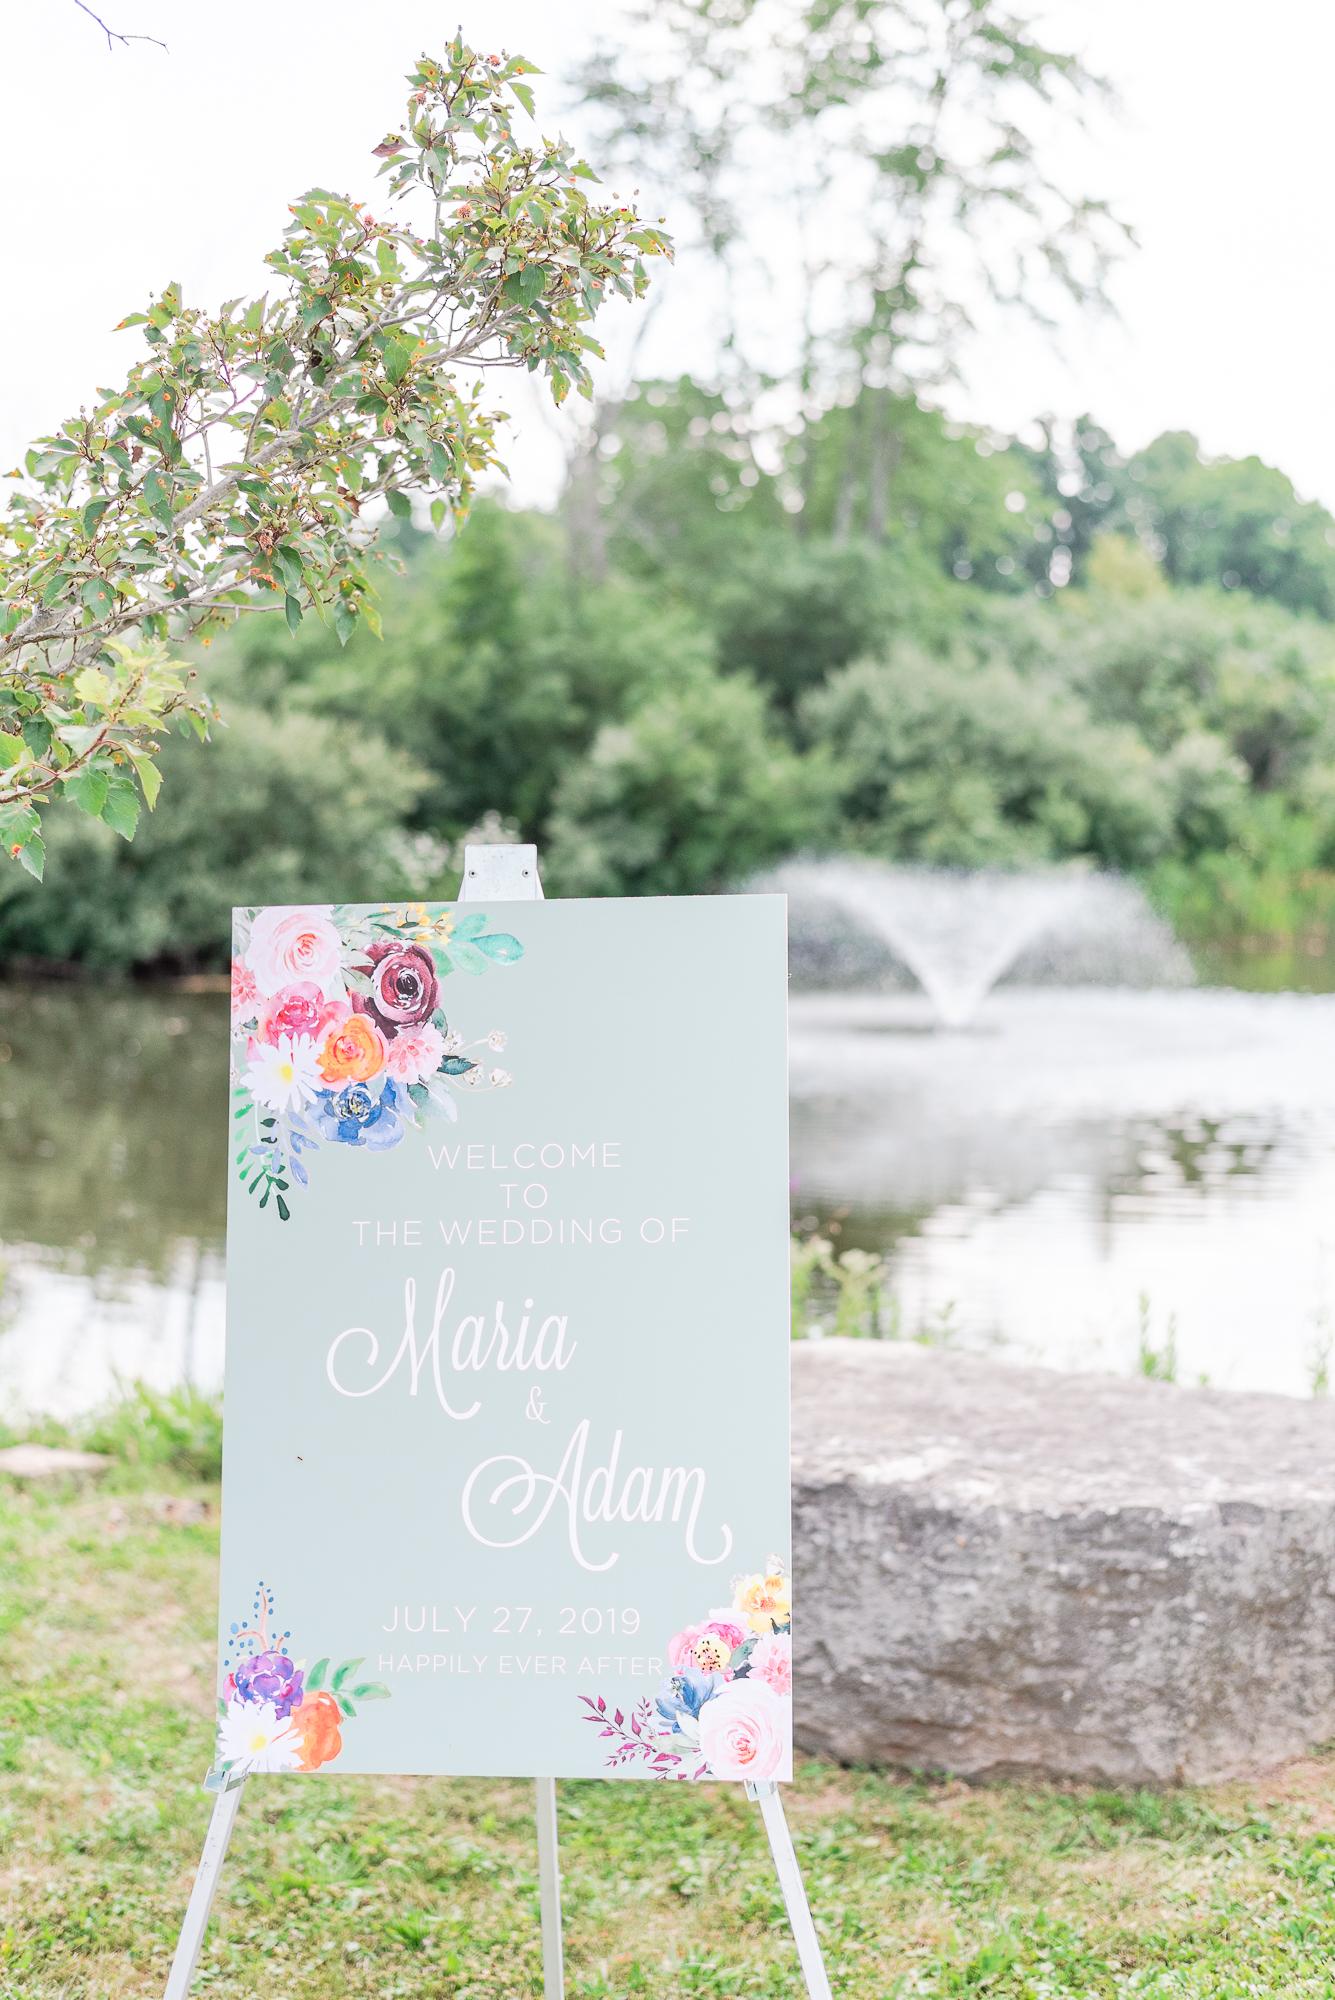 Maria+Adam_Summer Barn Wedding_The Barn at The North Star Preserve_Oberlin_Ohio-22.jpg